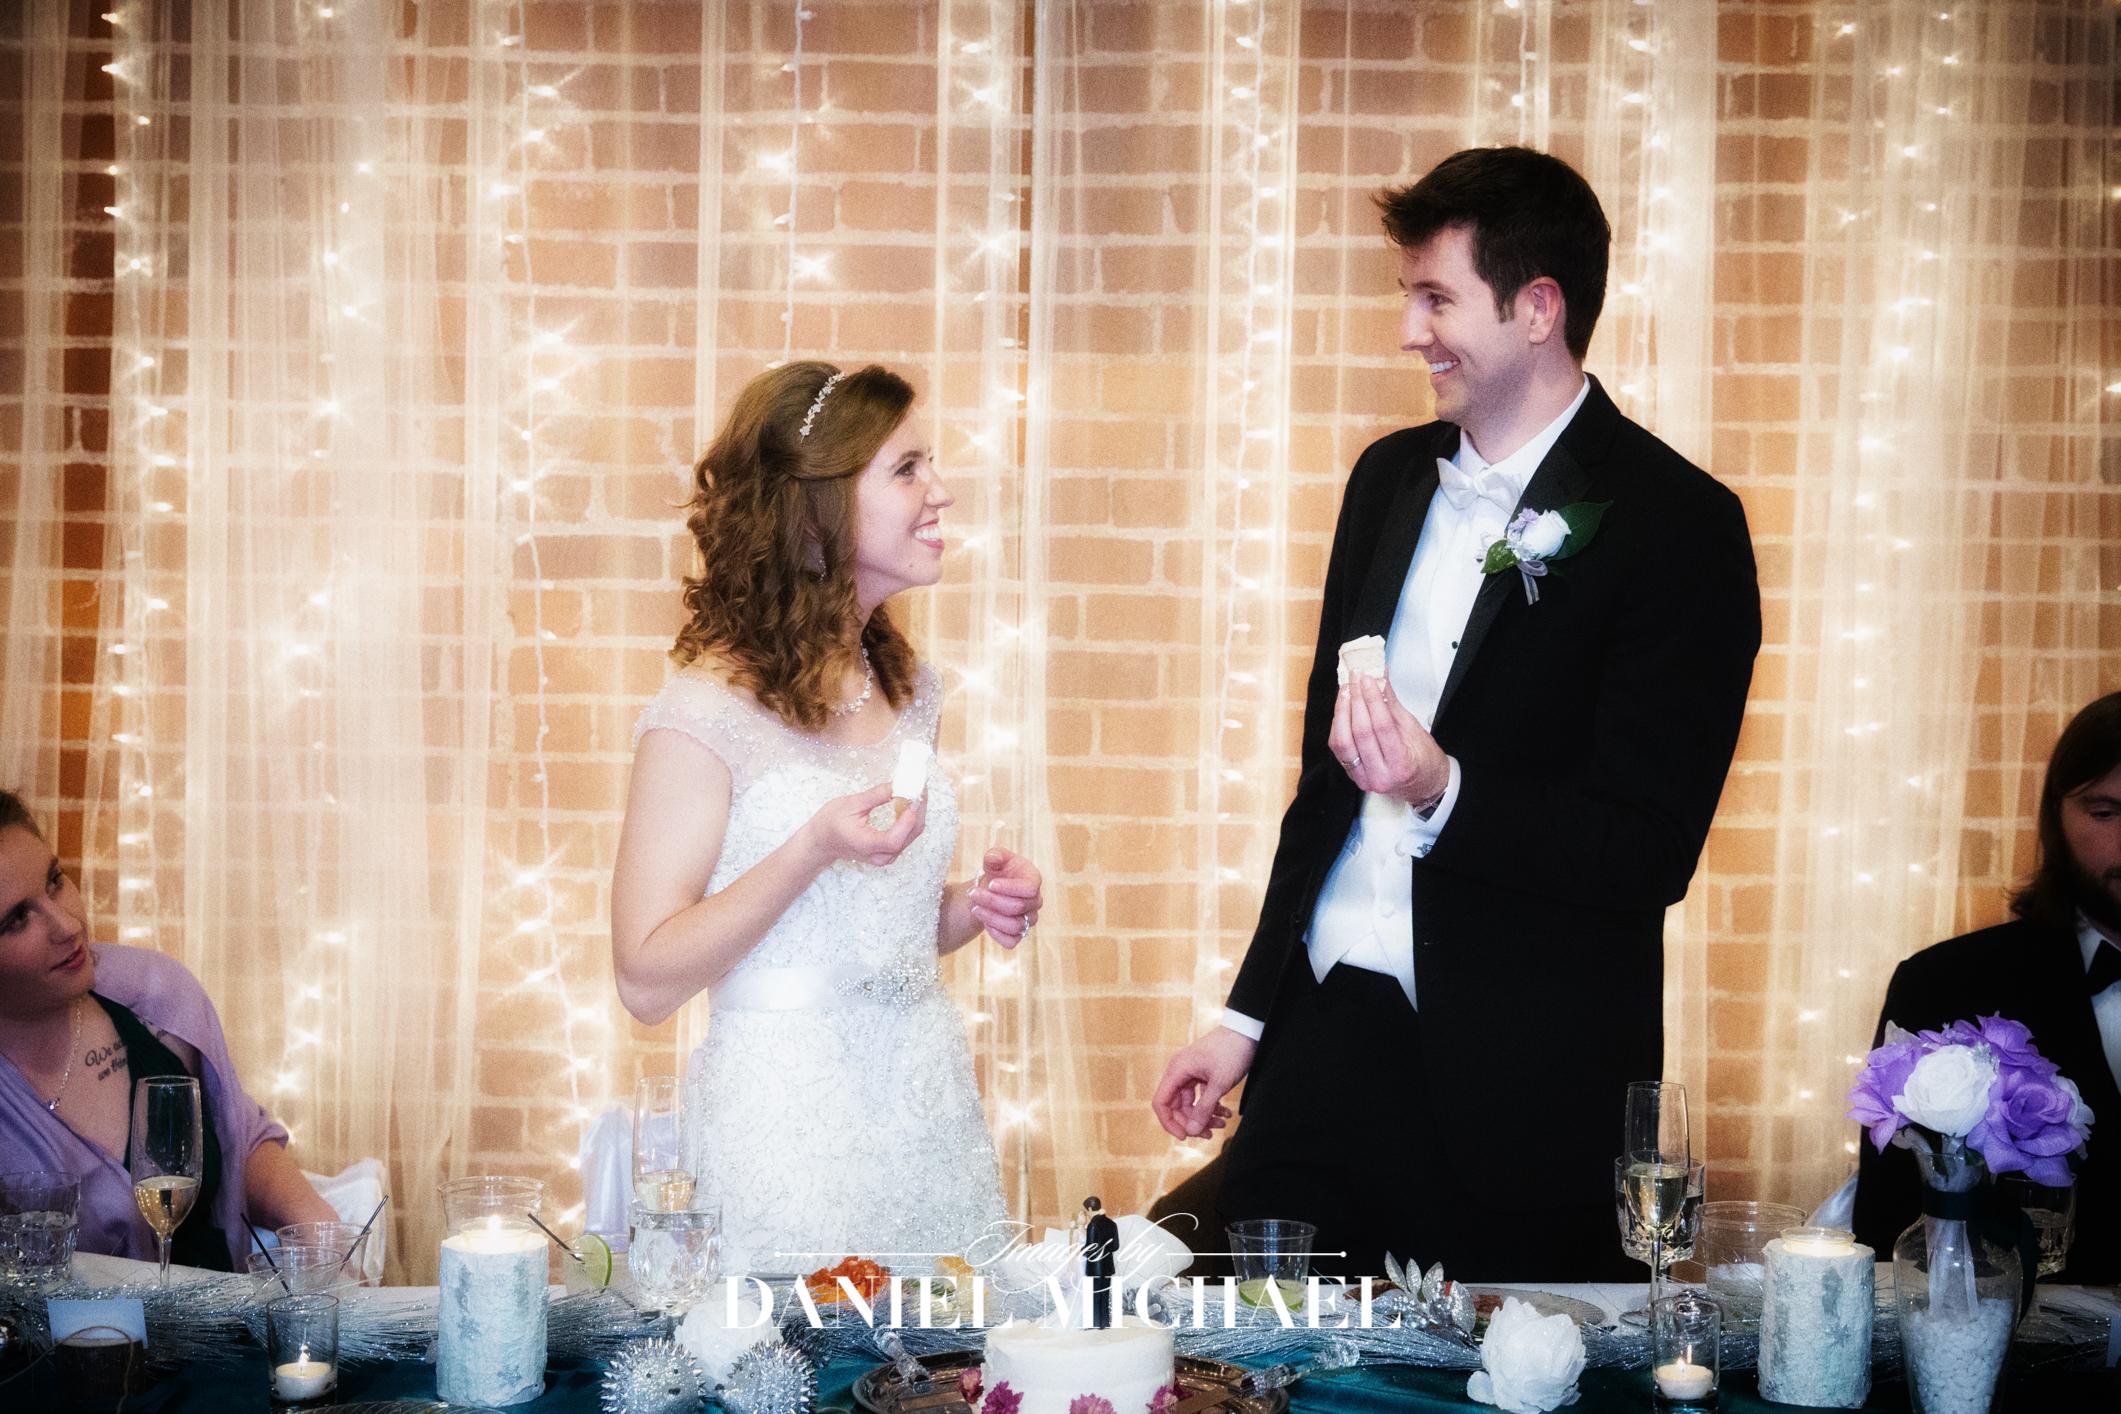 Longworth Hall Wedding Reception Venue Photographer Rustic